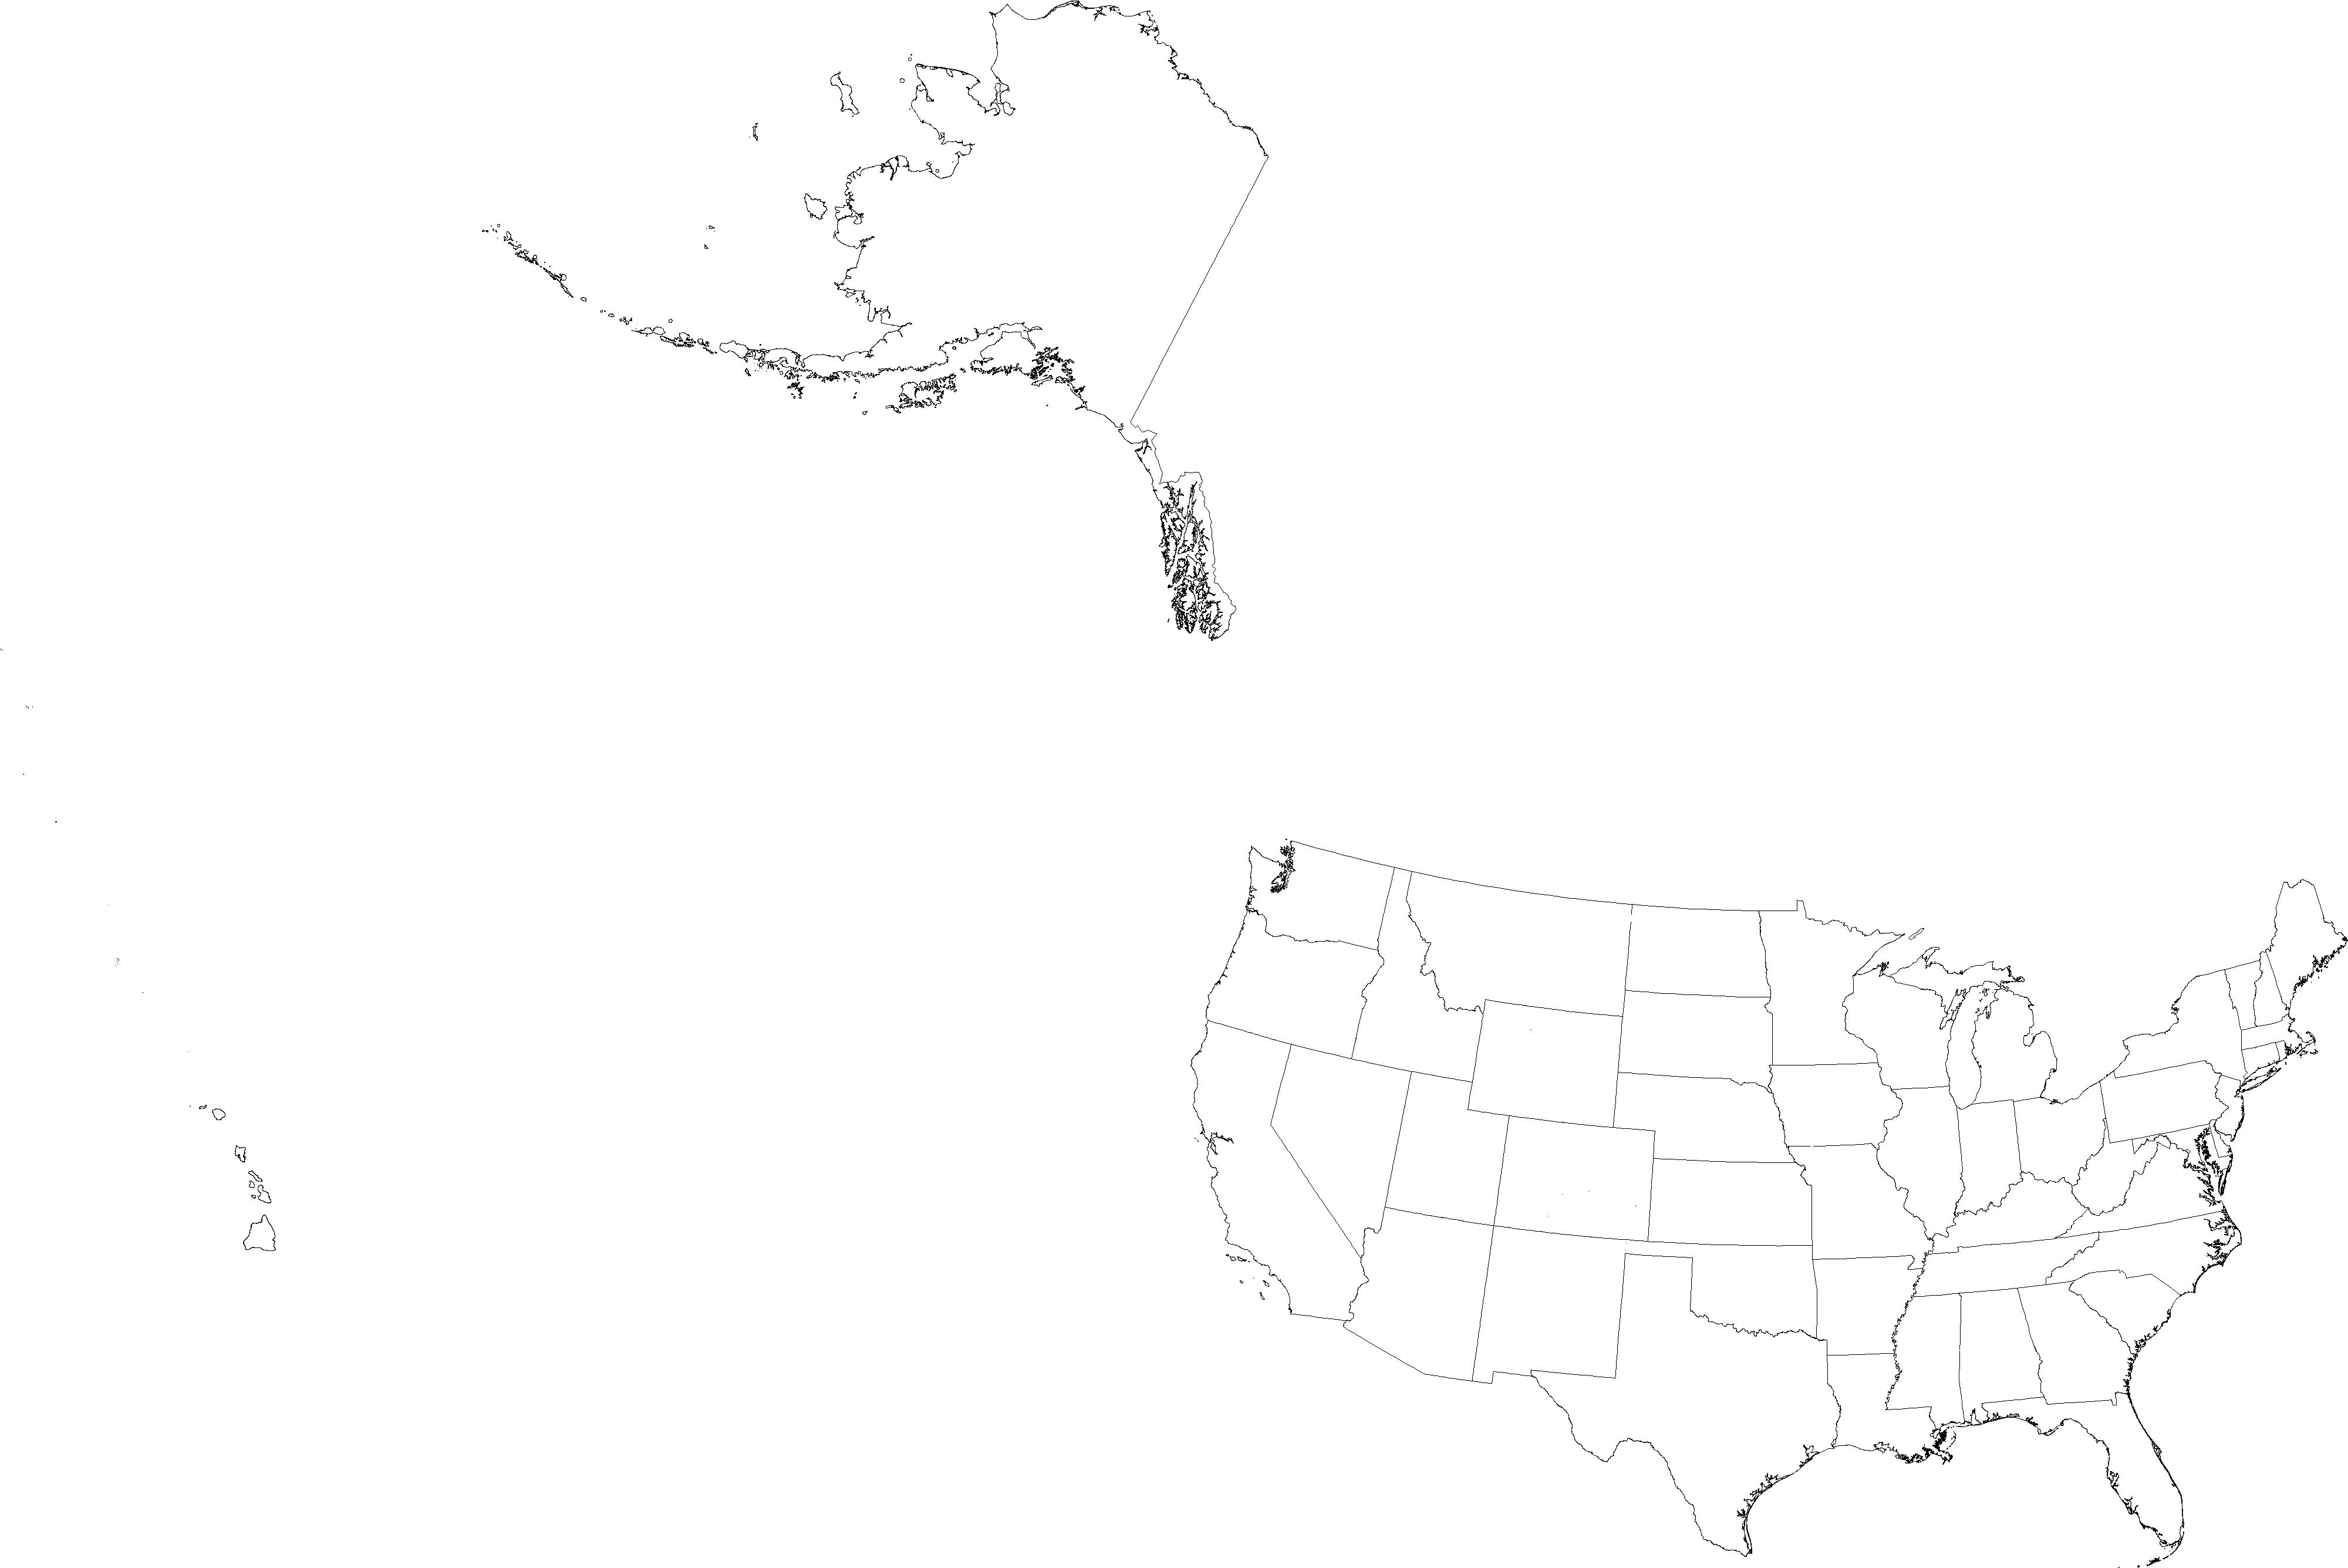 File:Usa-state-boundaries-4000.png - Wikimedia Commons